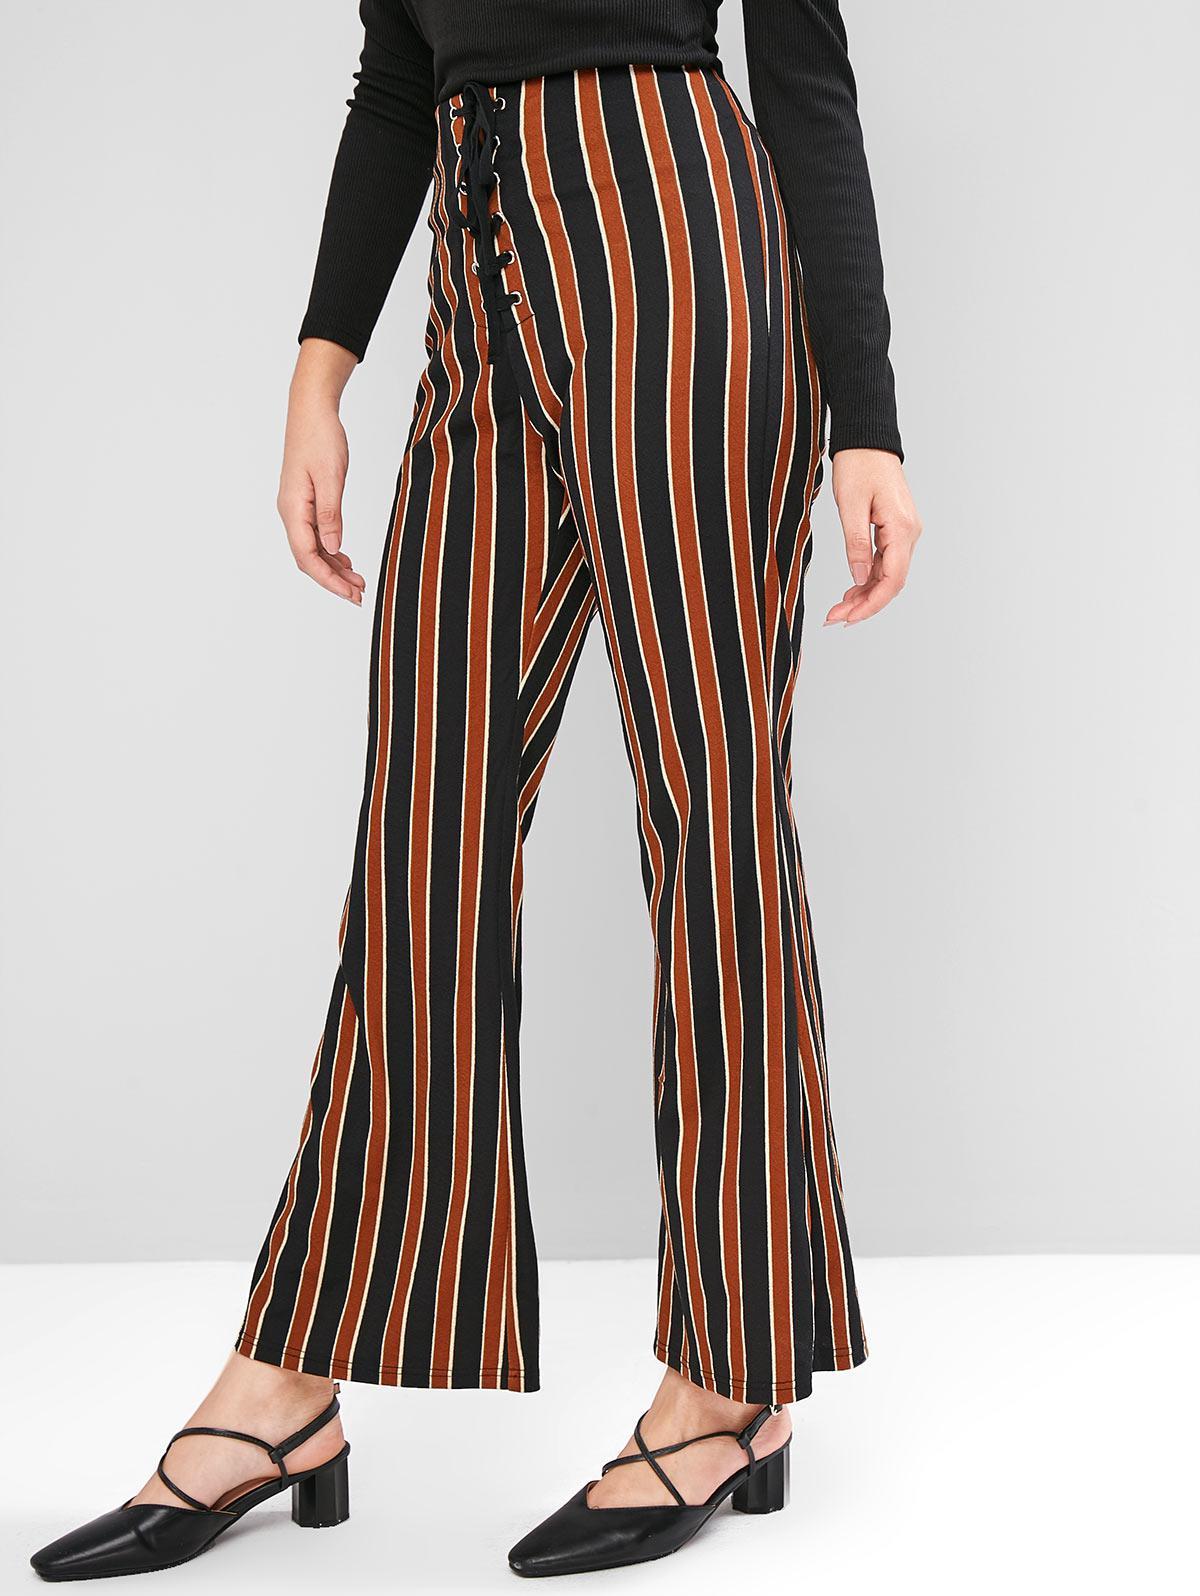 ZAFUL High Waisted Lace Up Stripes Flare Pants